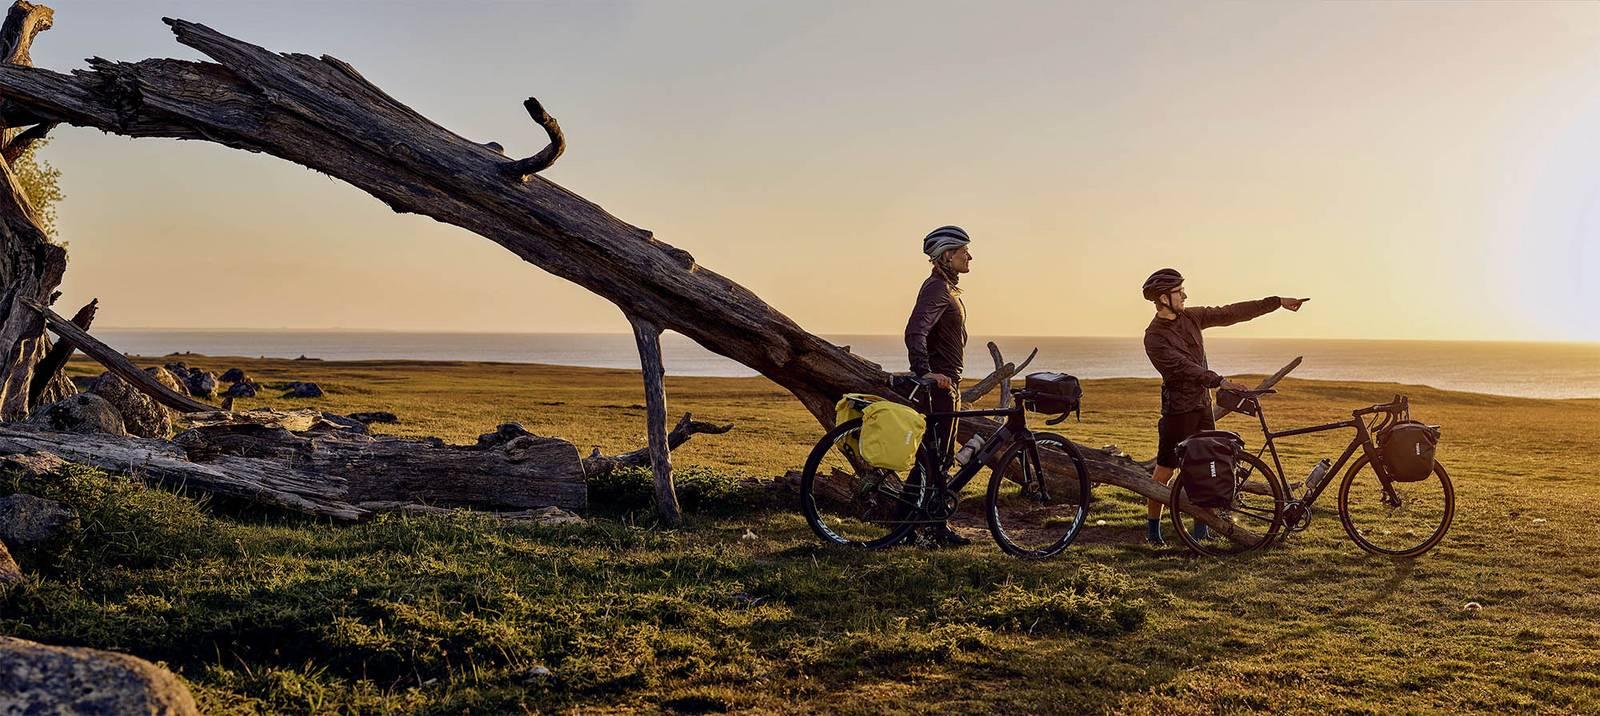 Bikepaking Touren Produkte